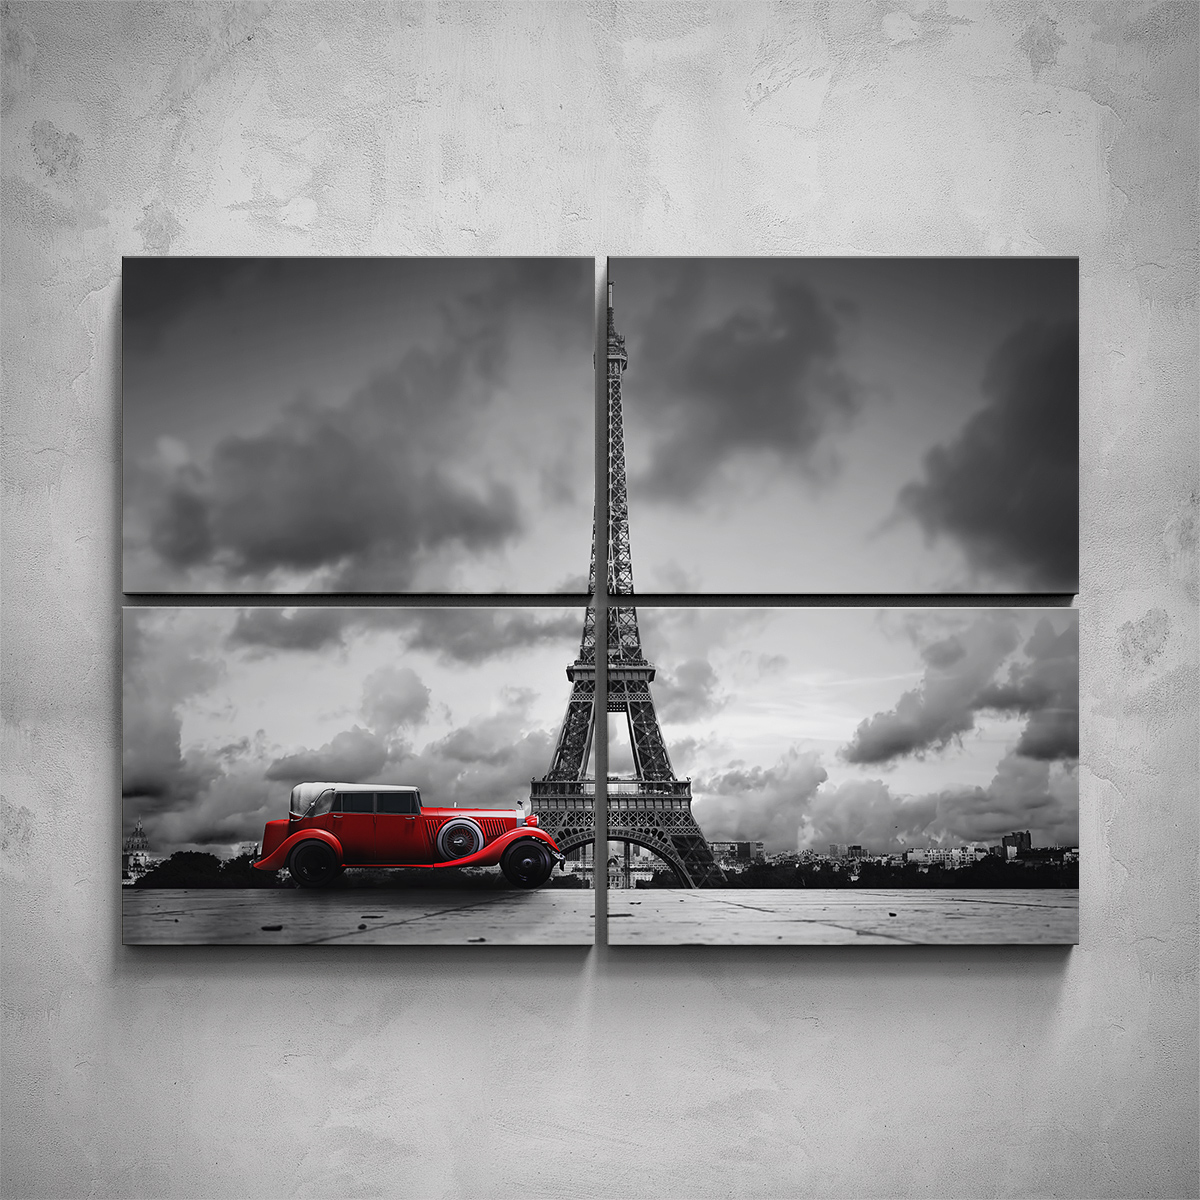 4-dílný obraz - Eiffelova věž - černobílá - PopyDesign